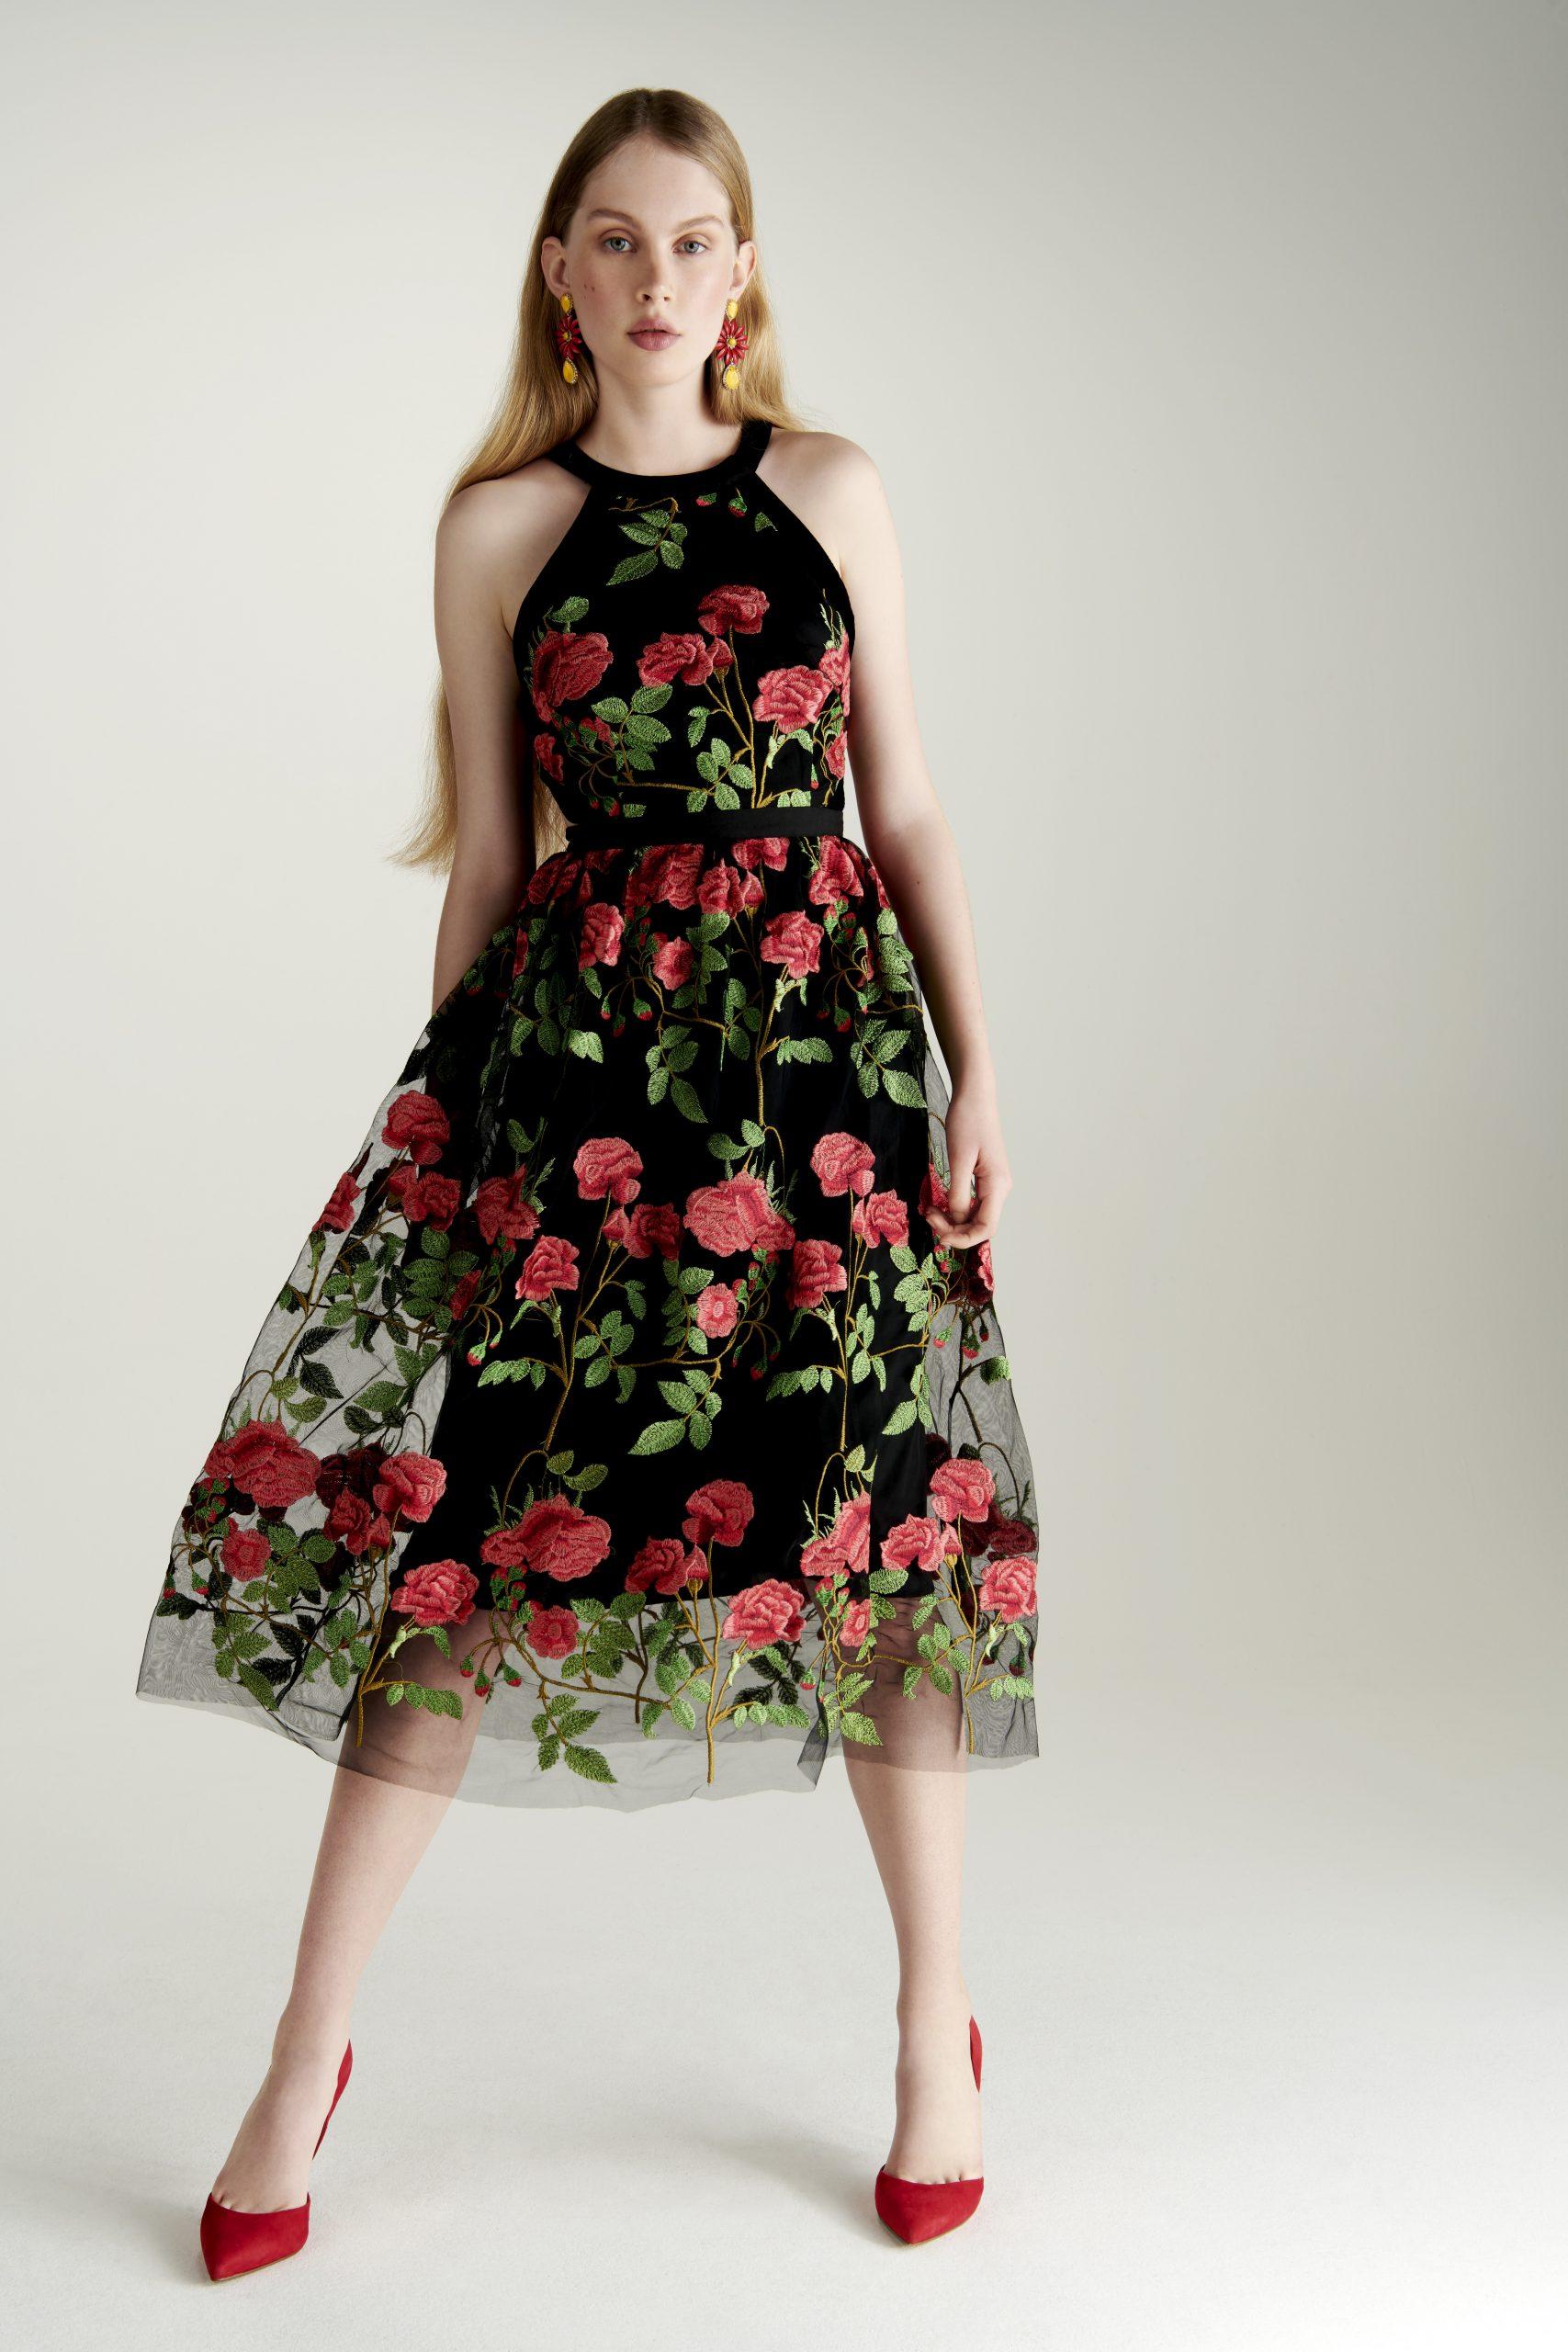 10 Cool Amazon Abendbekleidung Damen GalerieDesigner Schön Amazon Abendbekleidung Damen Boutique